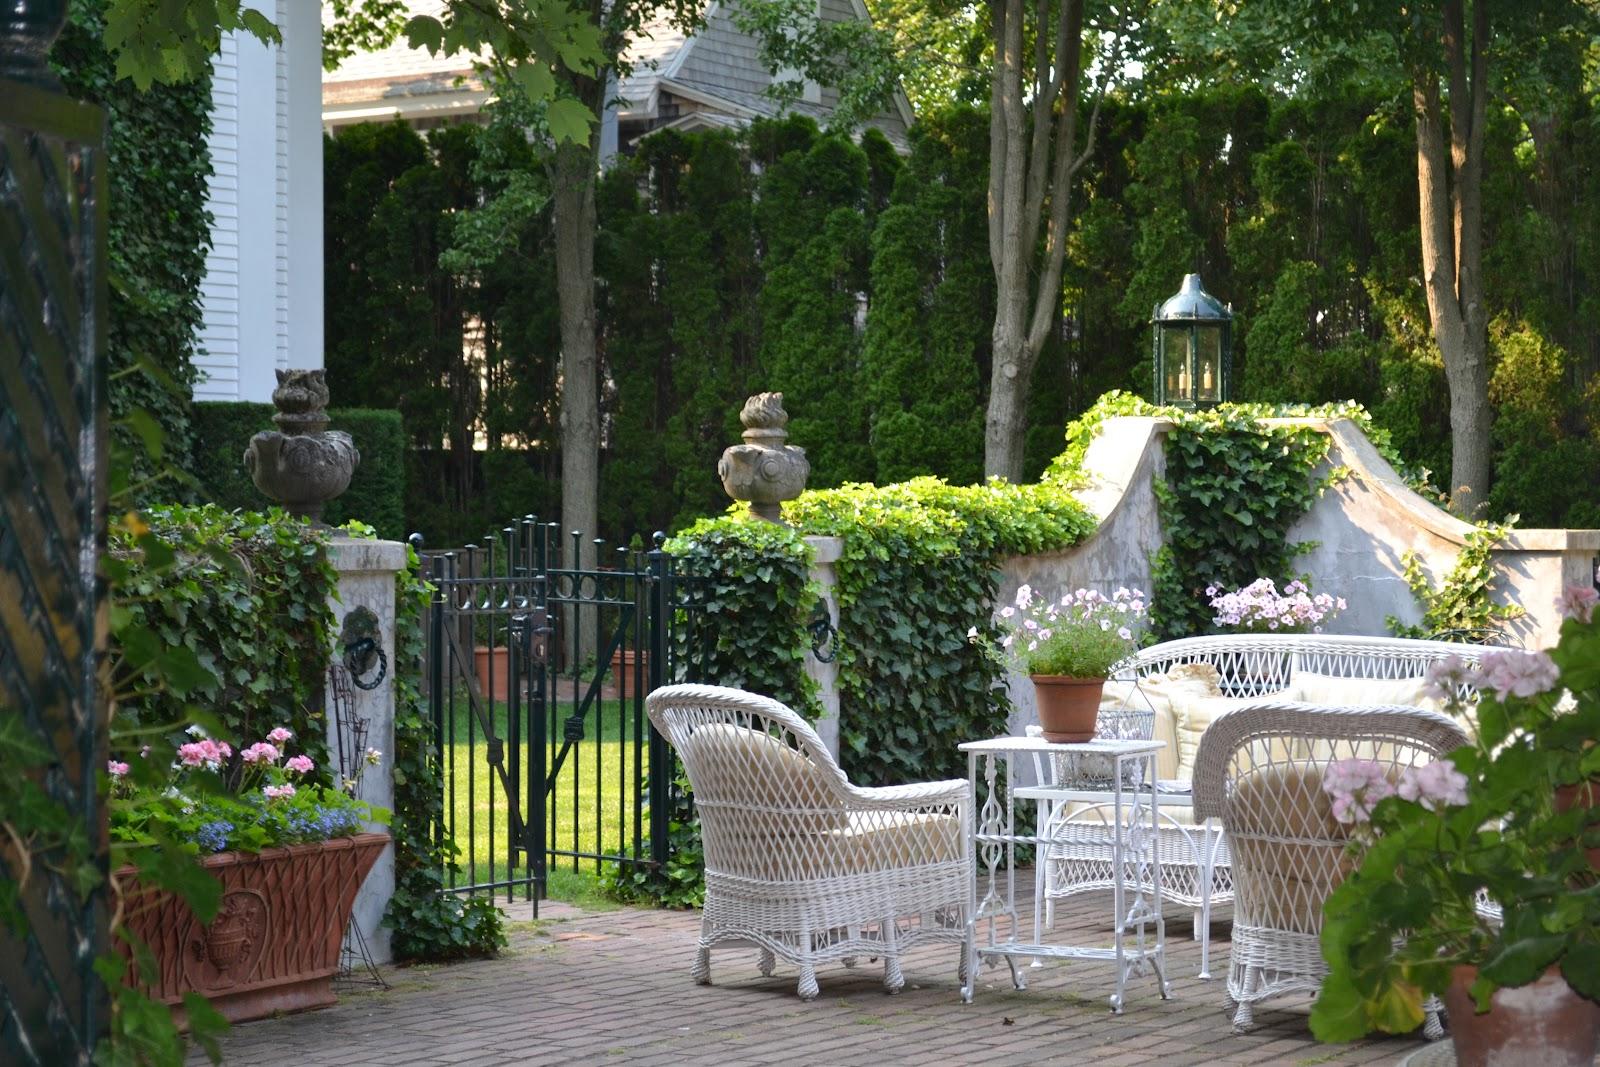 Xardinnova jardines con encanto for Jardines con encanto ideas